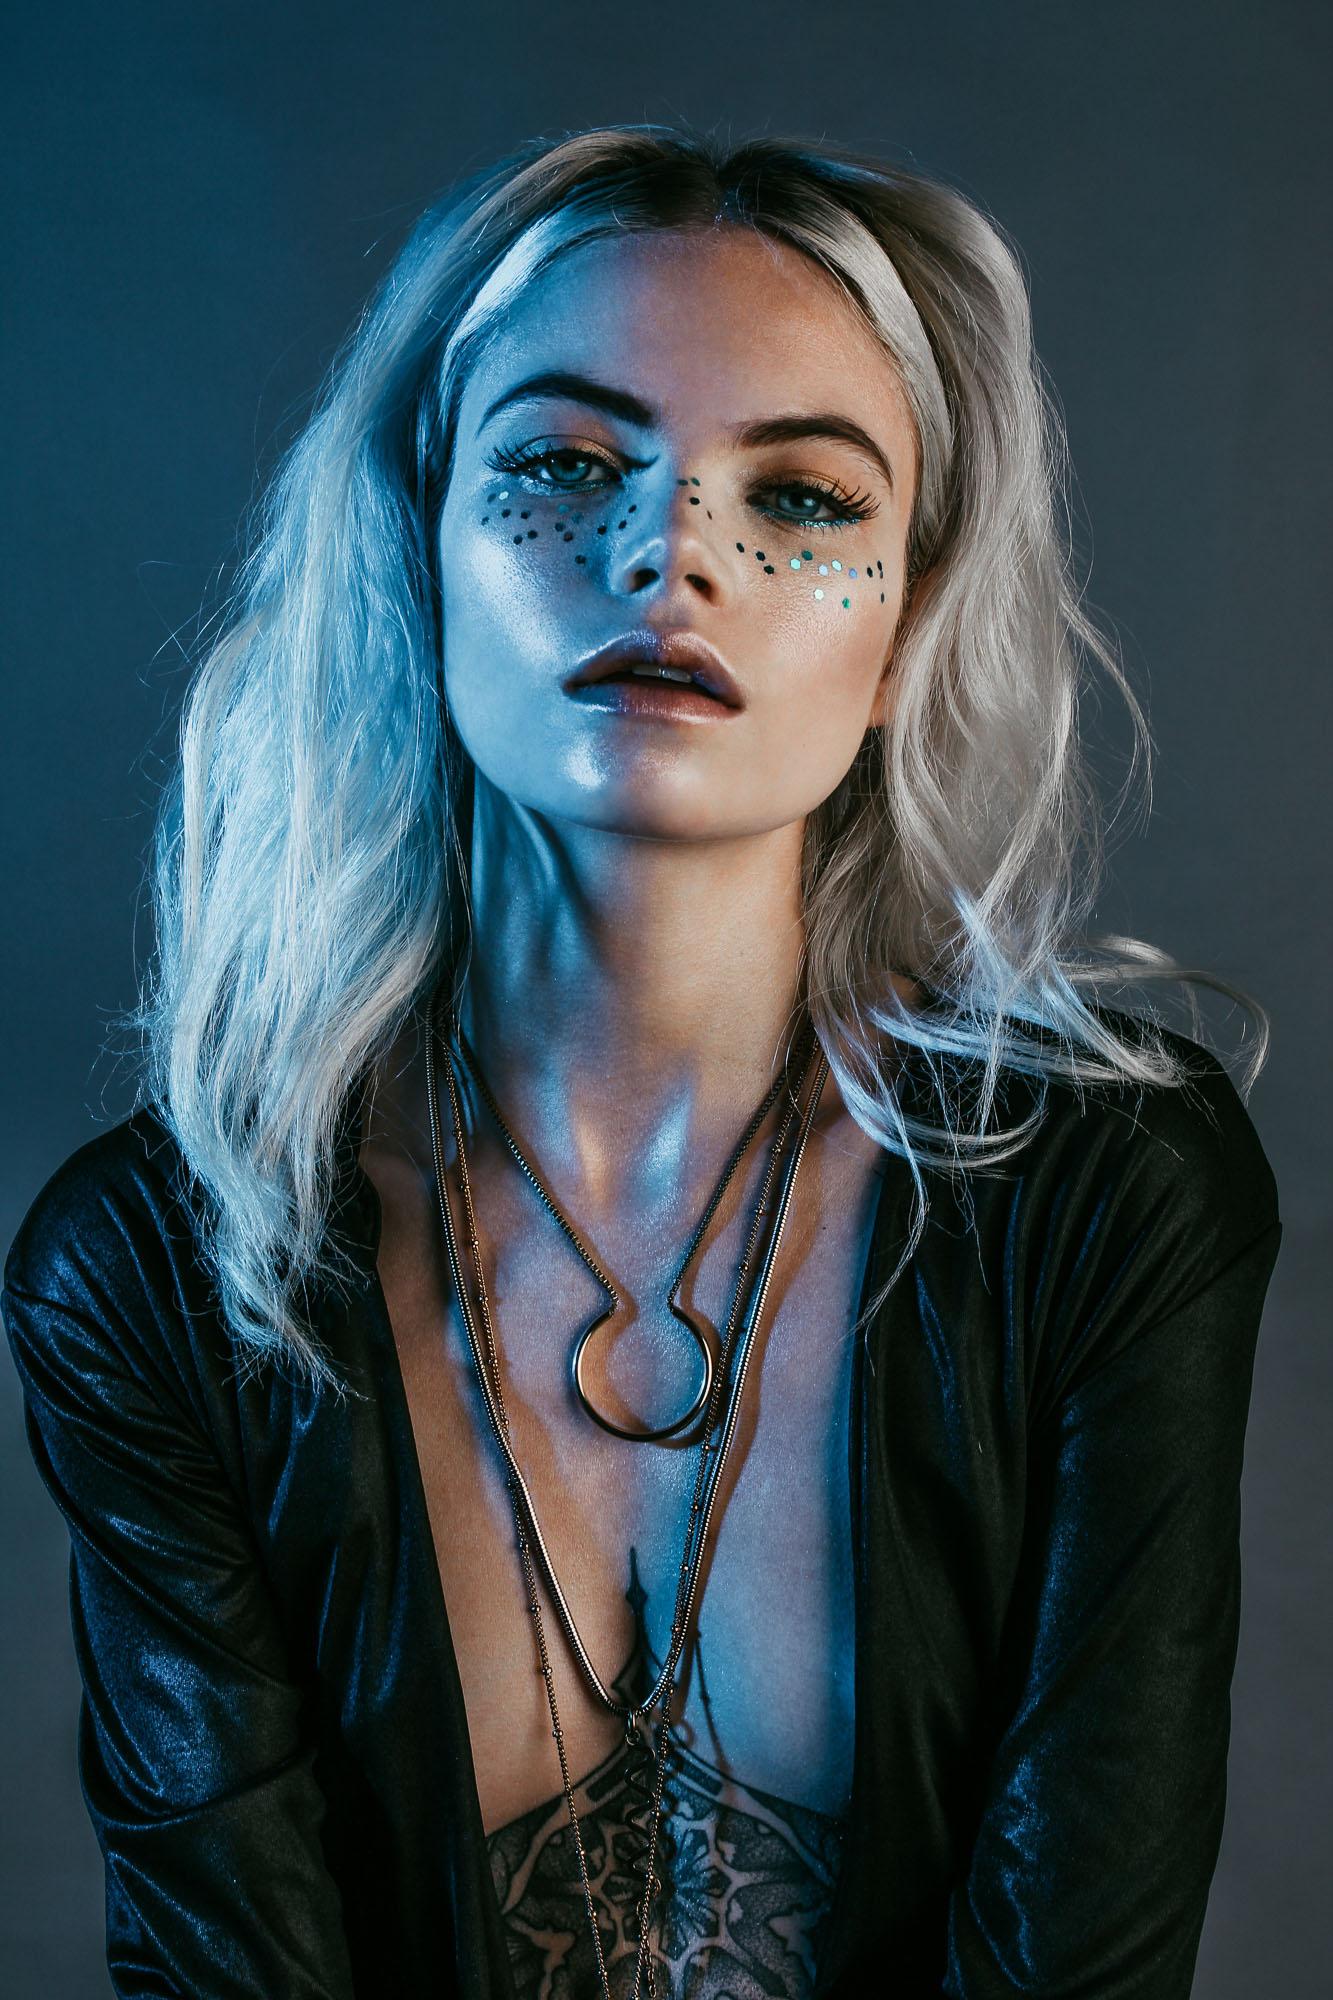 Portrait Photography Lighting